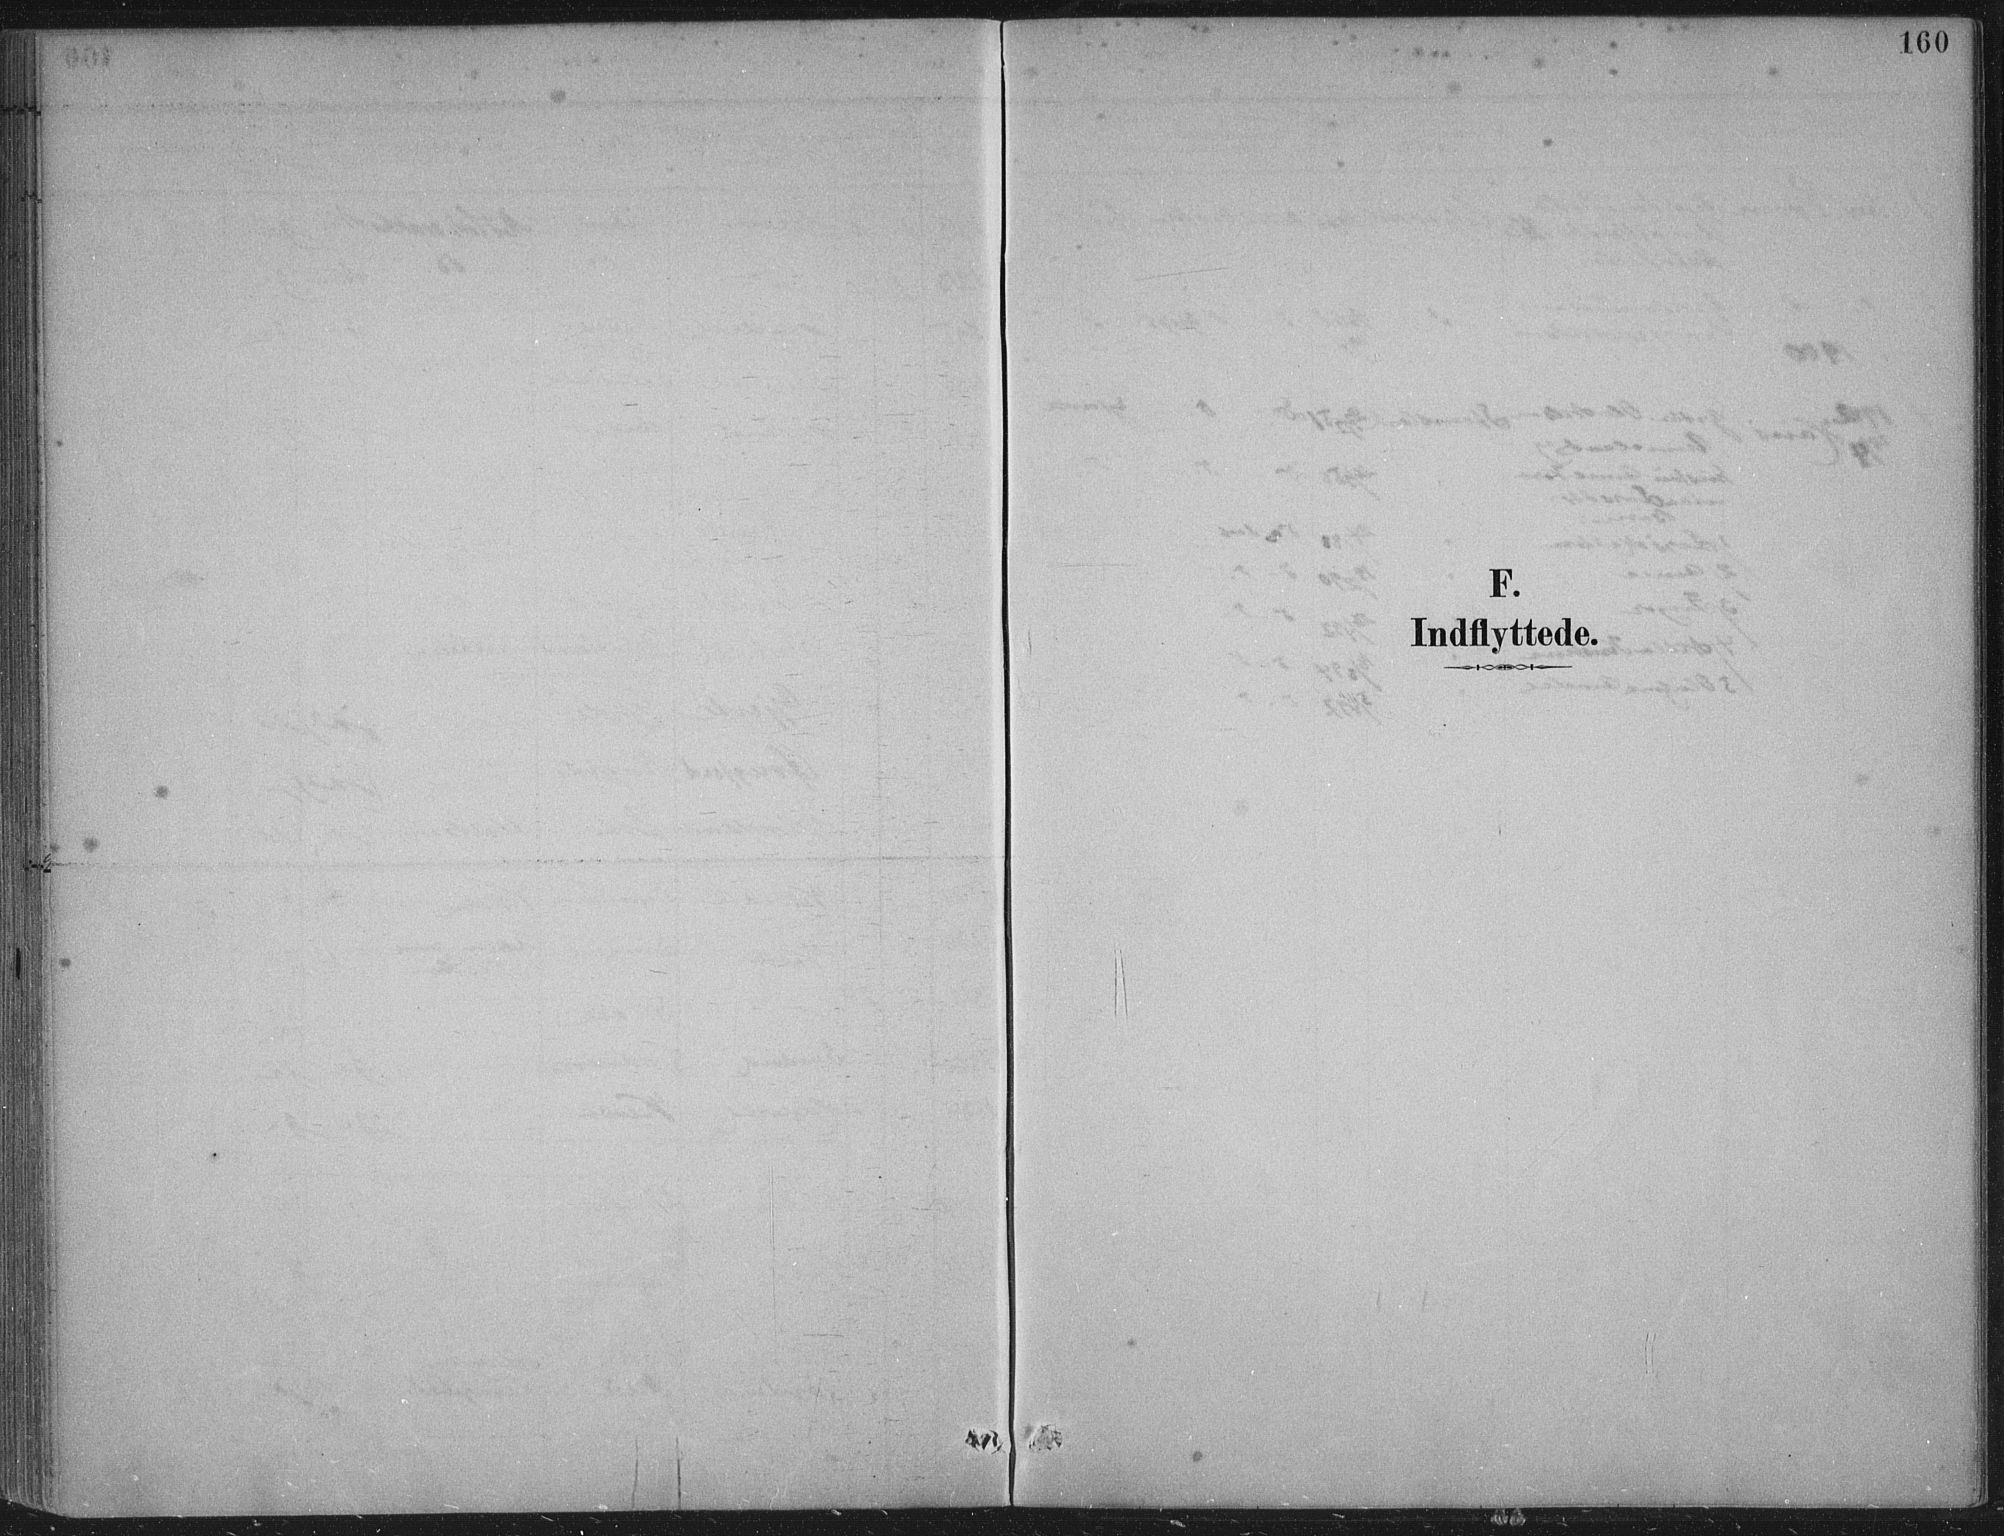 SAST, Vikedal sokneprestkontor, IV: Ministerialbok nr. A 11, 1884-1933, s. 160